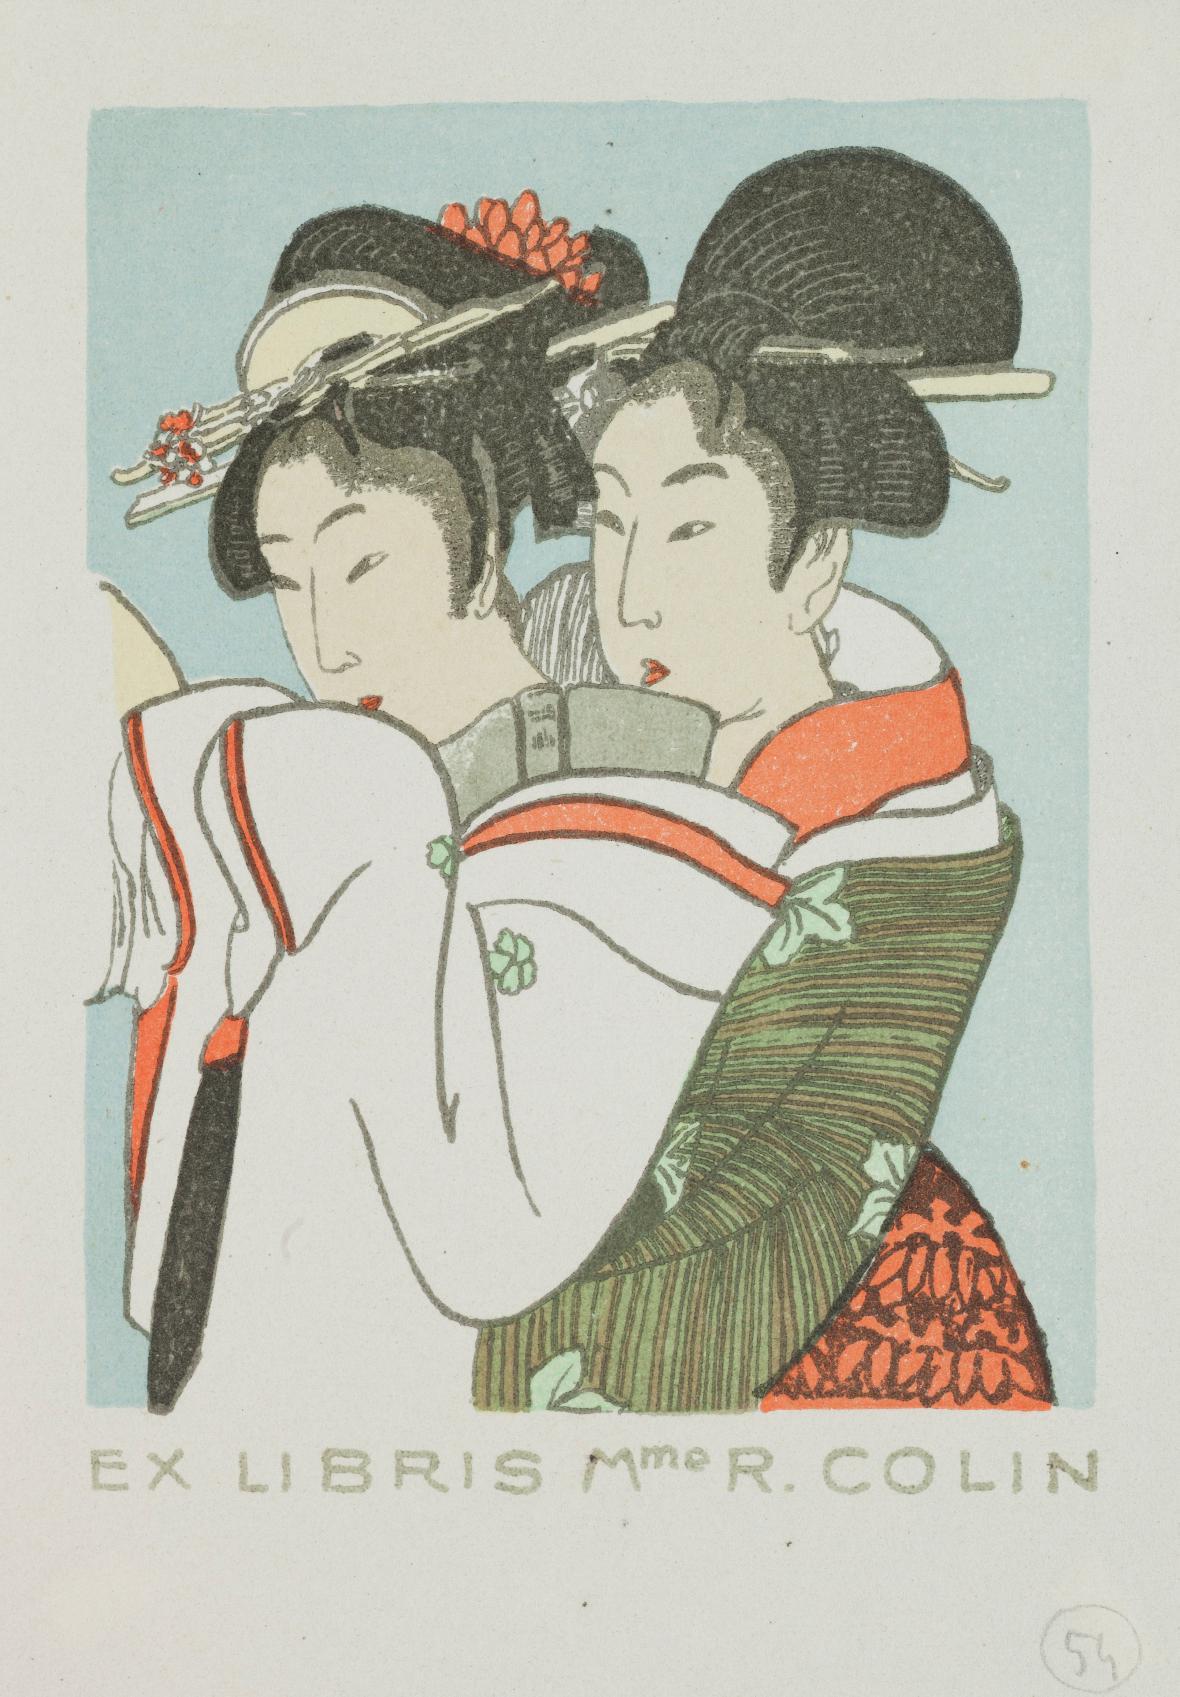 Otakar Vaňáč / Exlibris Campbell R. Colin – Japonská dvojice na motivy Kitagawy Utamara, 1926